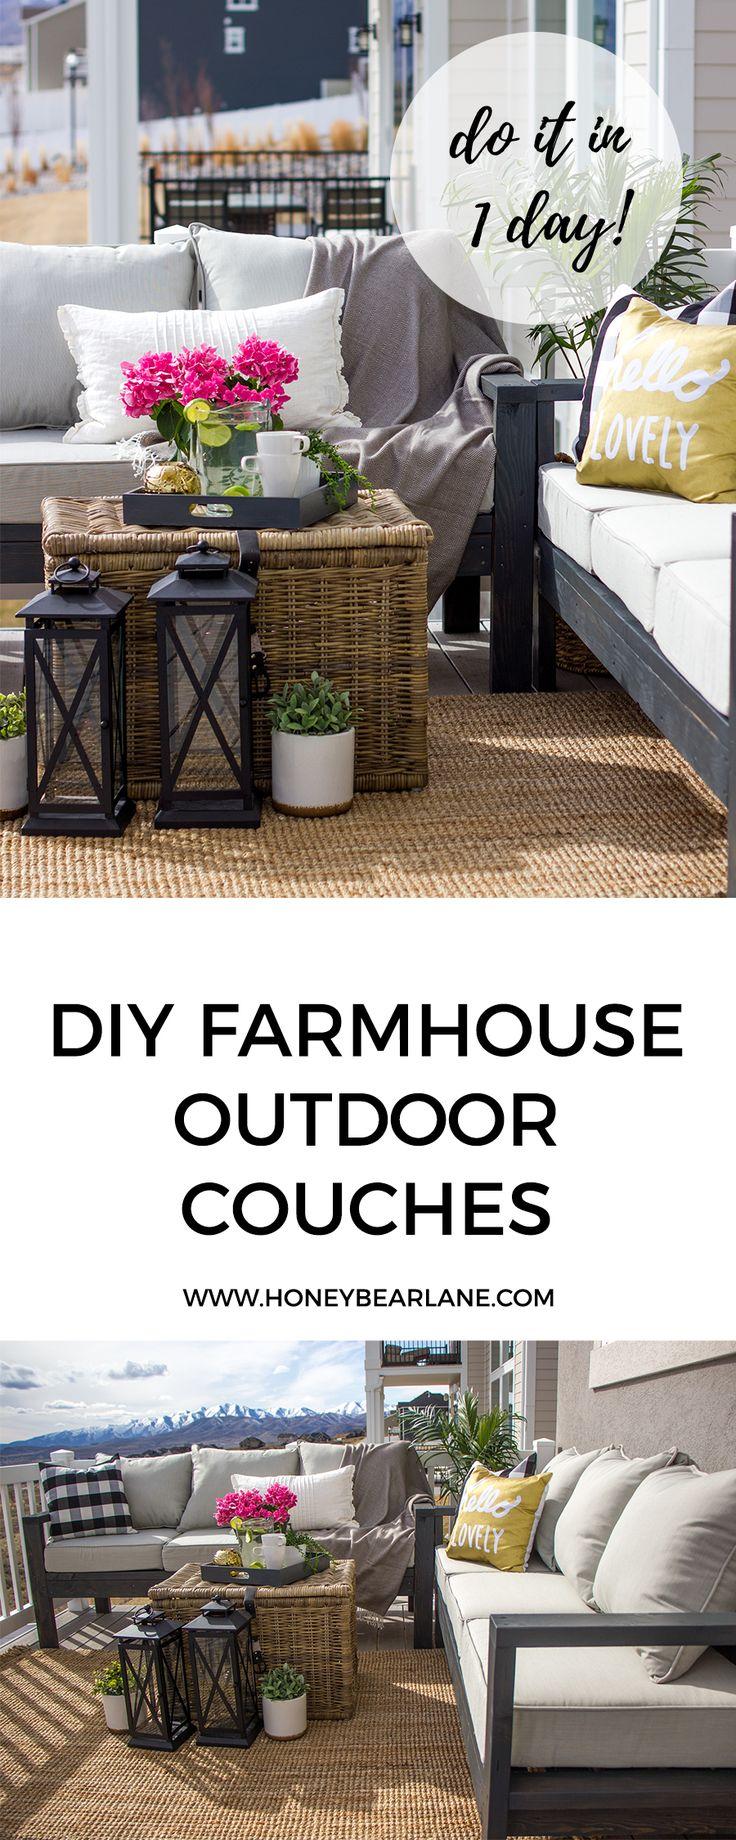 Amazing Diy Farmhouse Outdoor Couches | Diy Farmhouse Table | Diy Farmhouse Decor |  Diy Farmhouse |